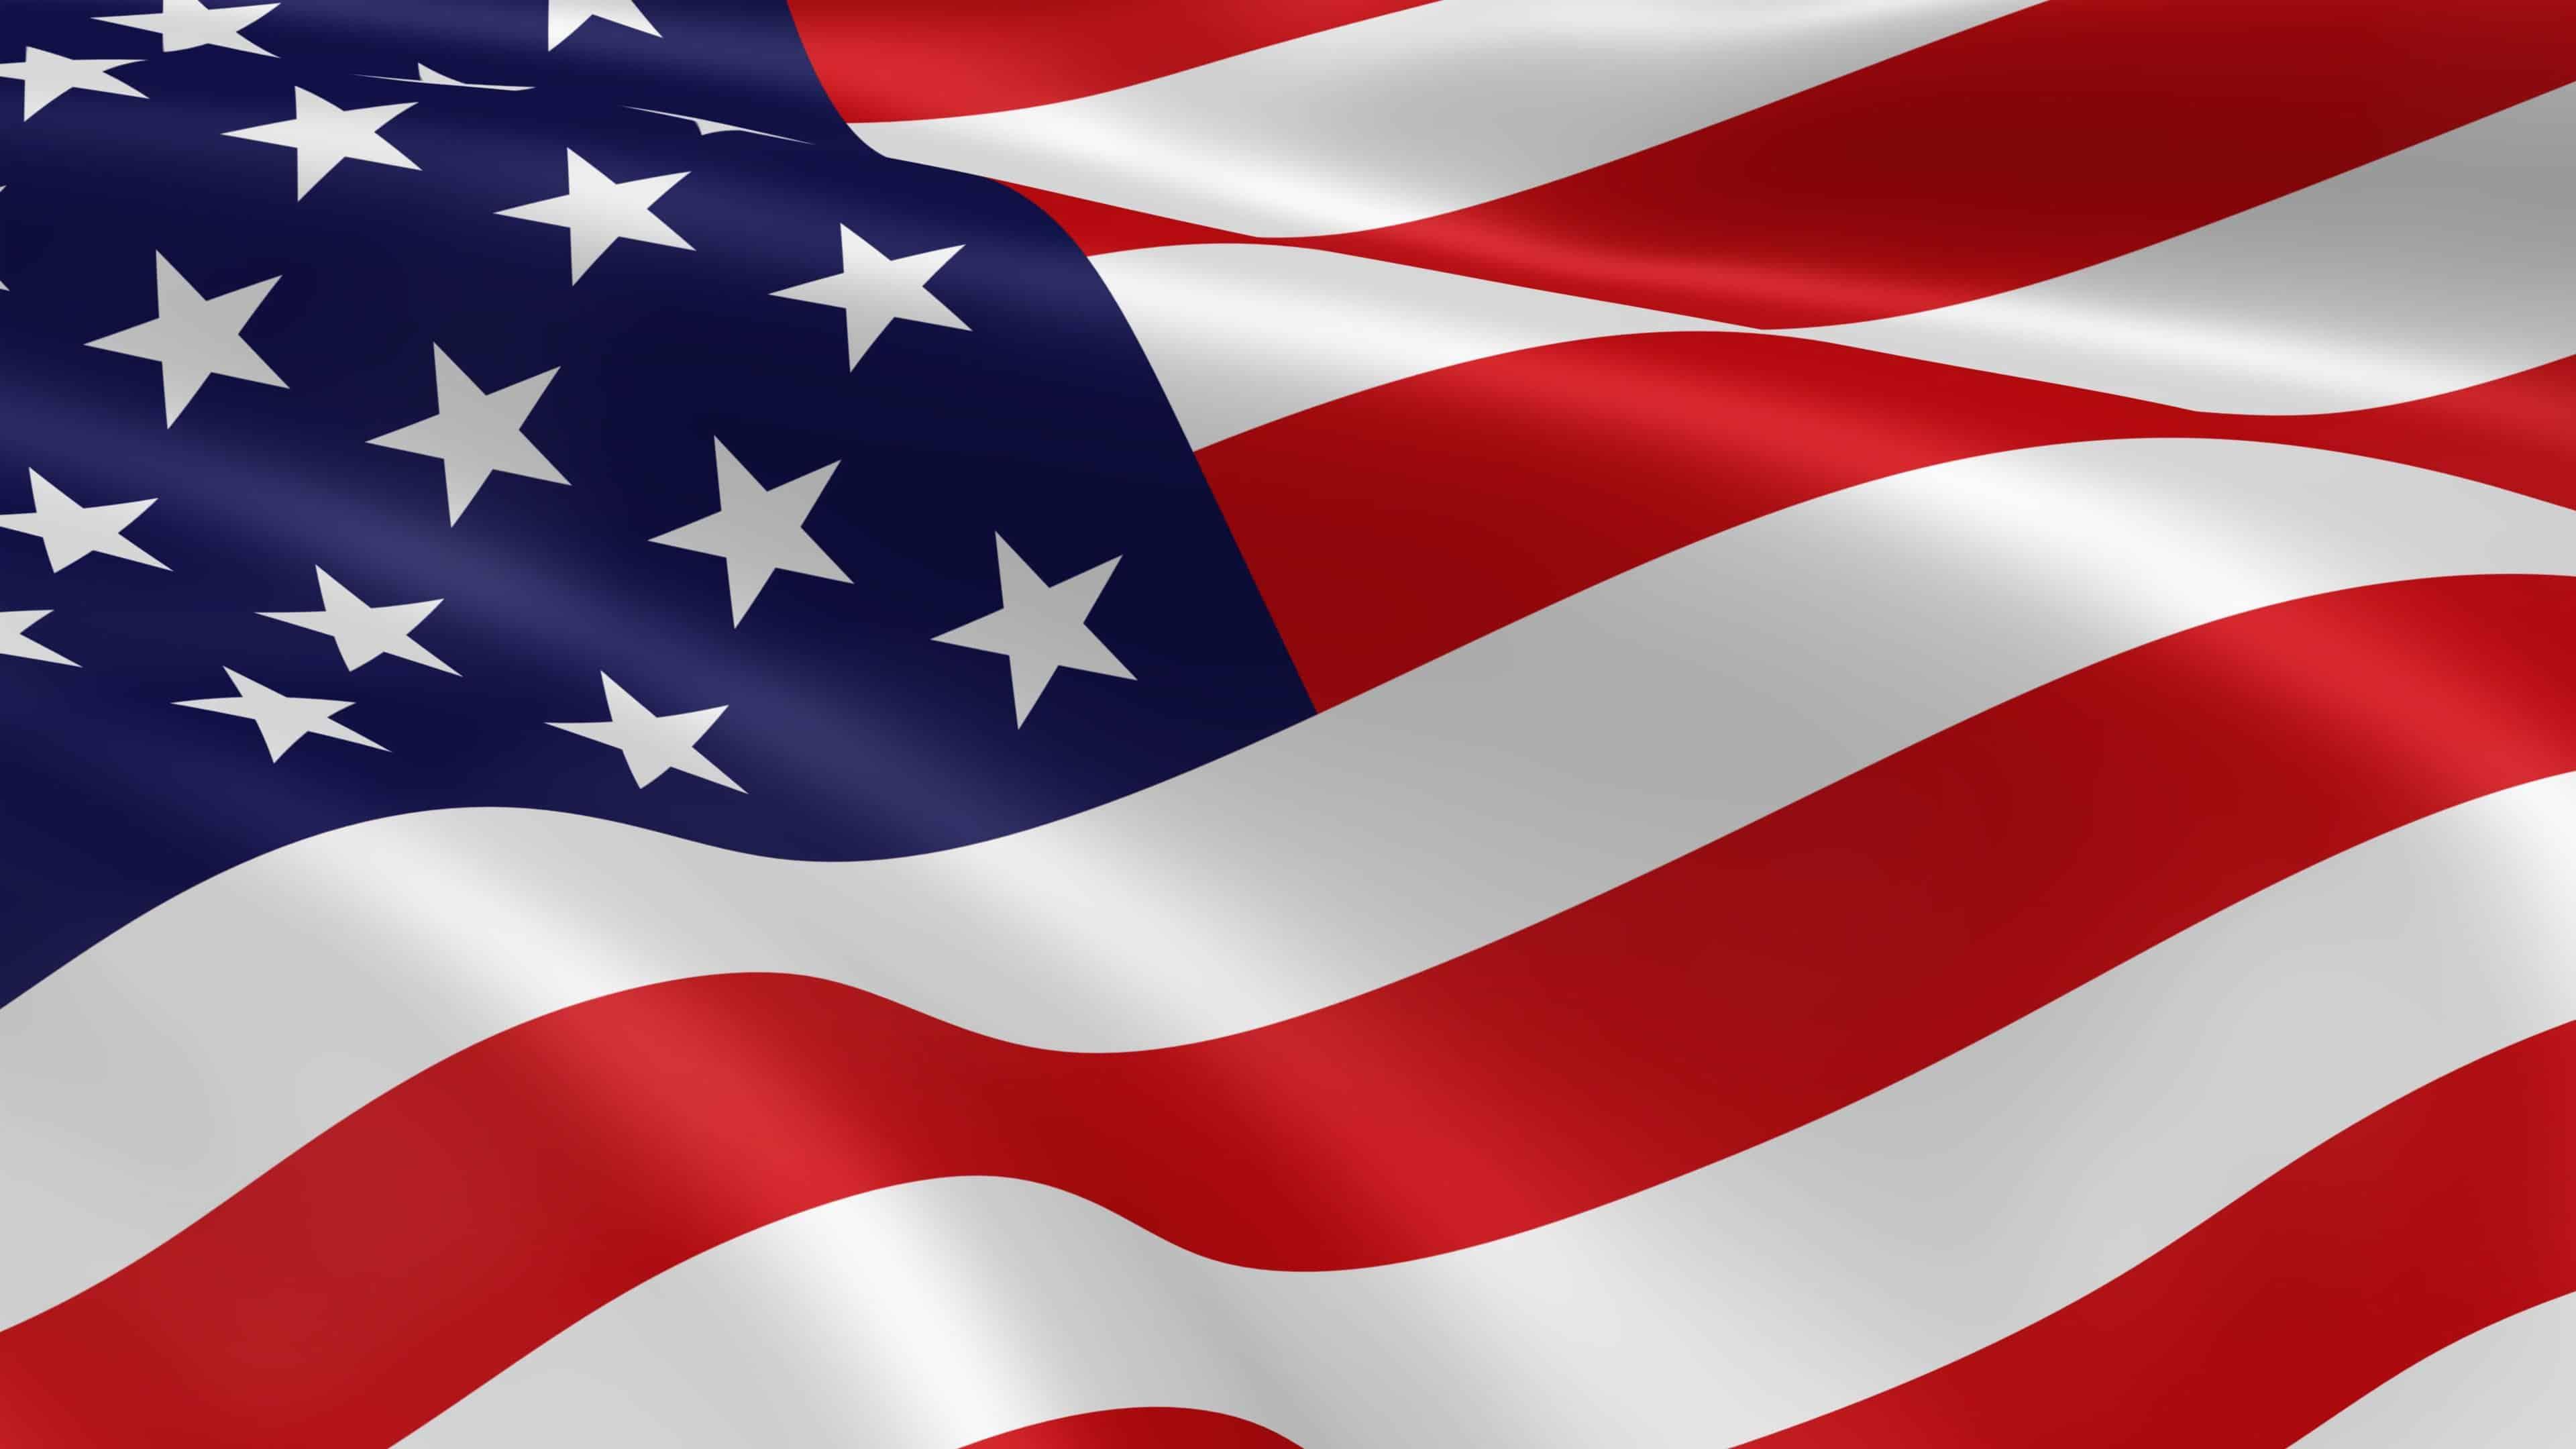 American Flag UHD 4K Wallpaper Pixelz 3840x2160